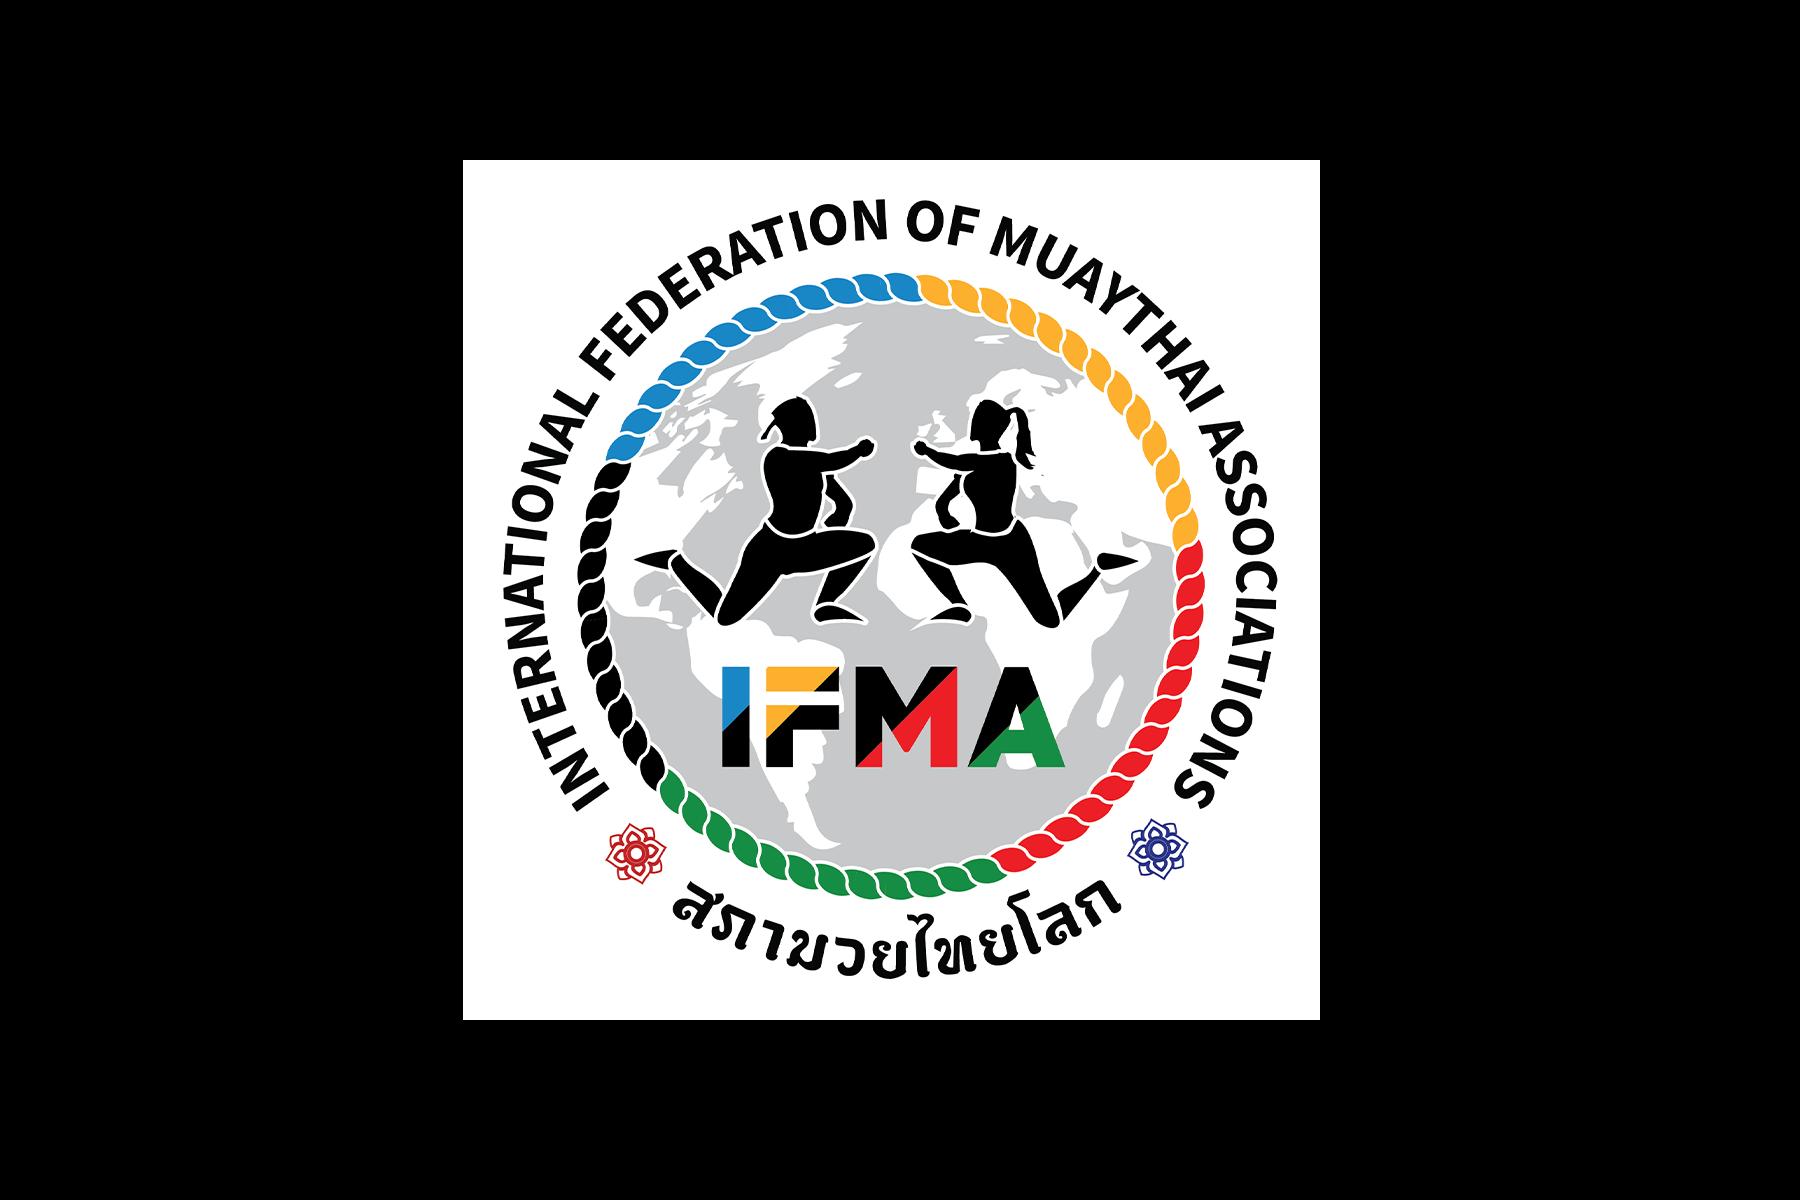 Morning Activity – Good Morning Muaythai by IFMA